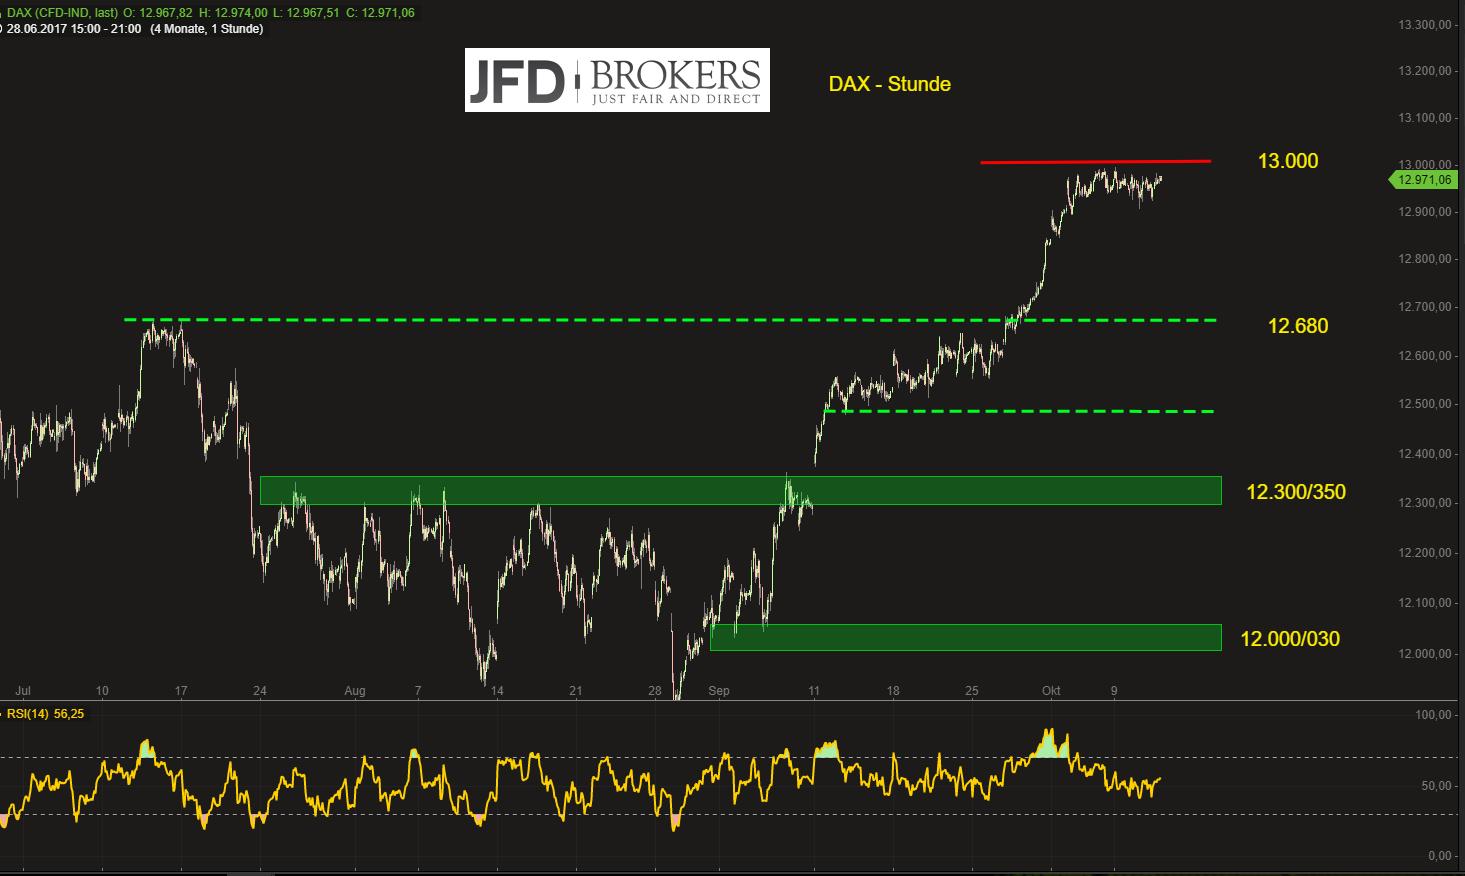 DAX-wann-geht-s-über-die-13-000-JFD-Brokers-GodmodeTrader.de-2